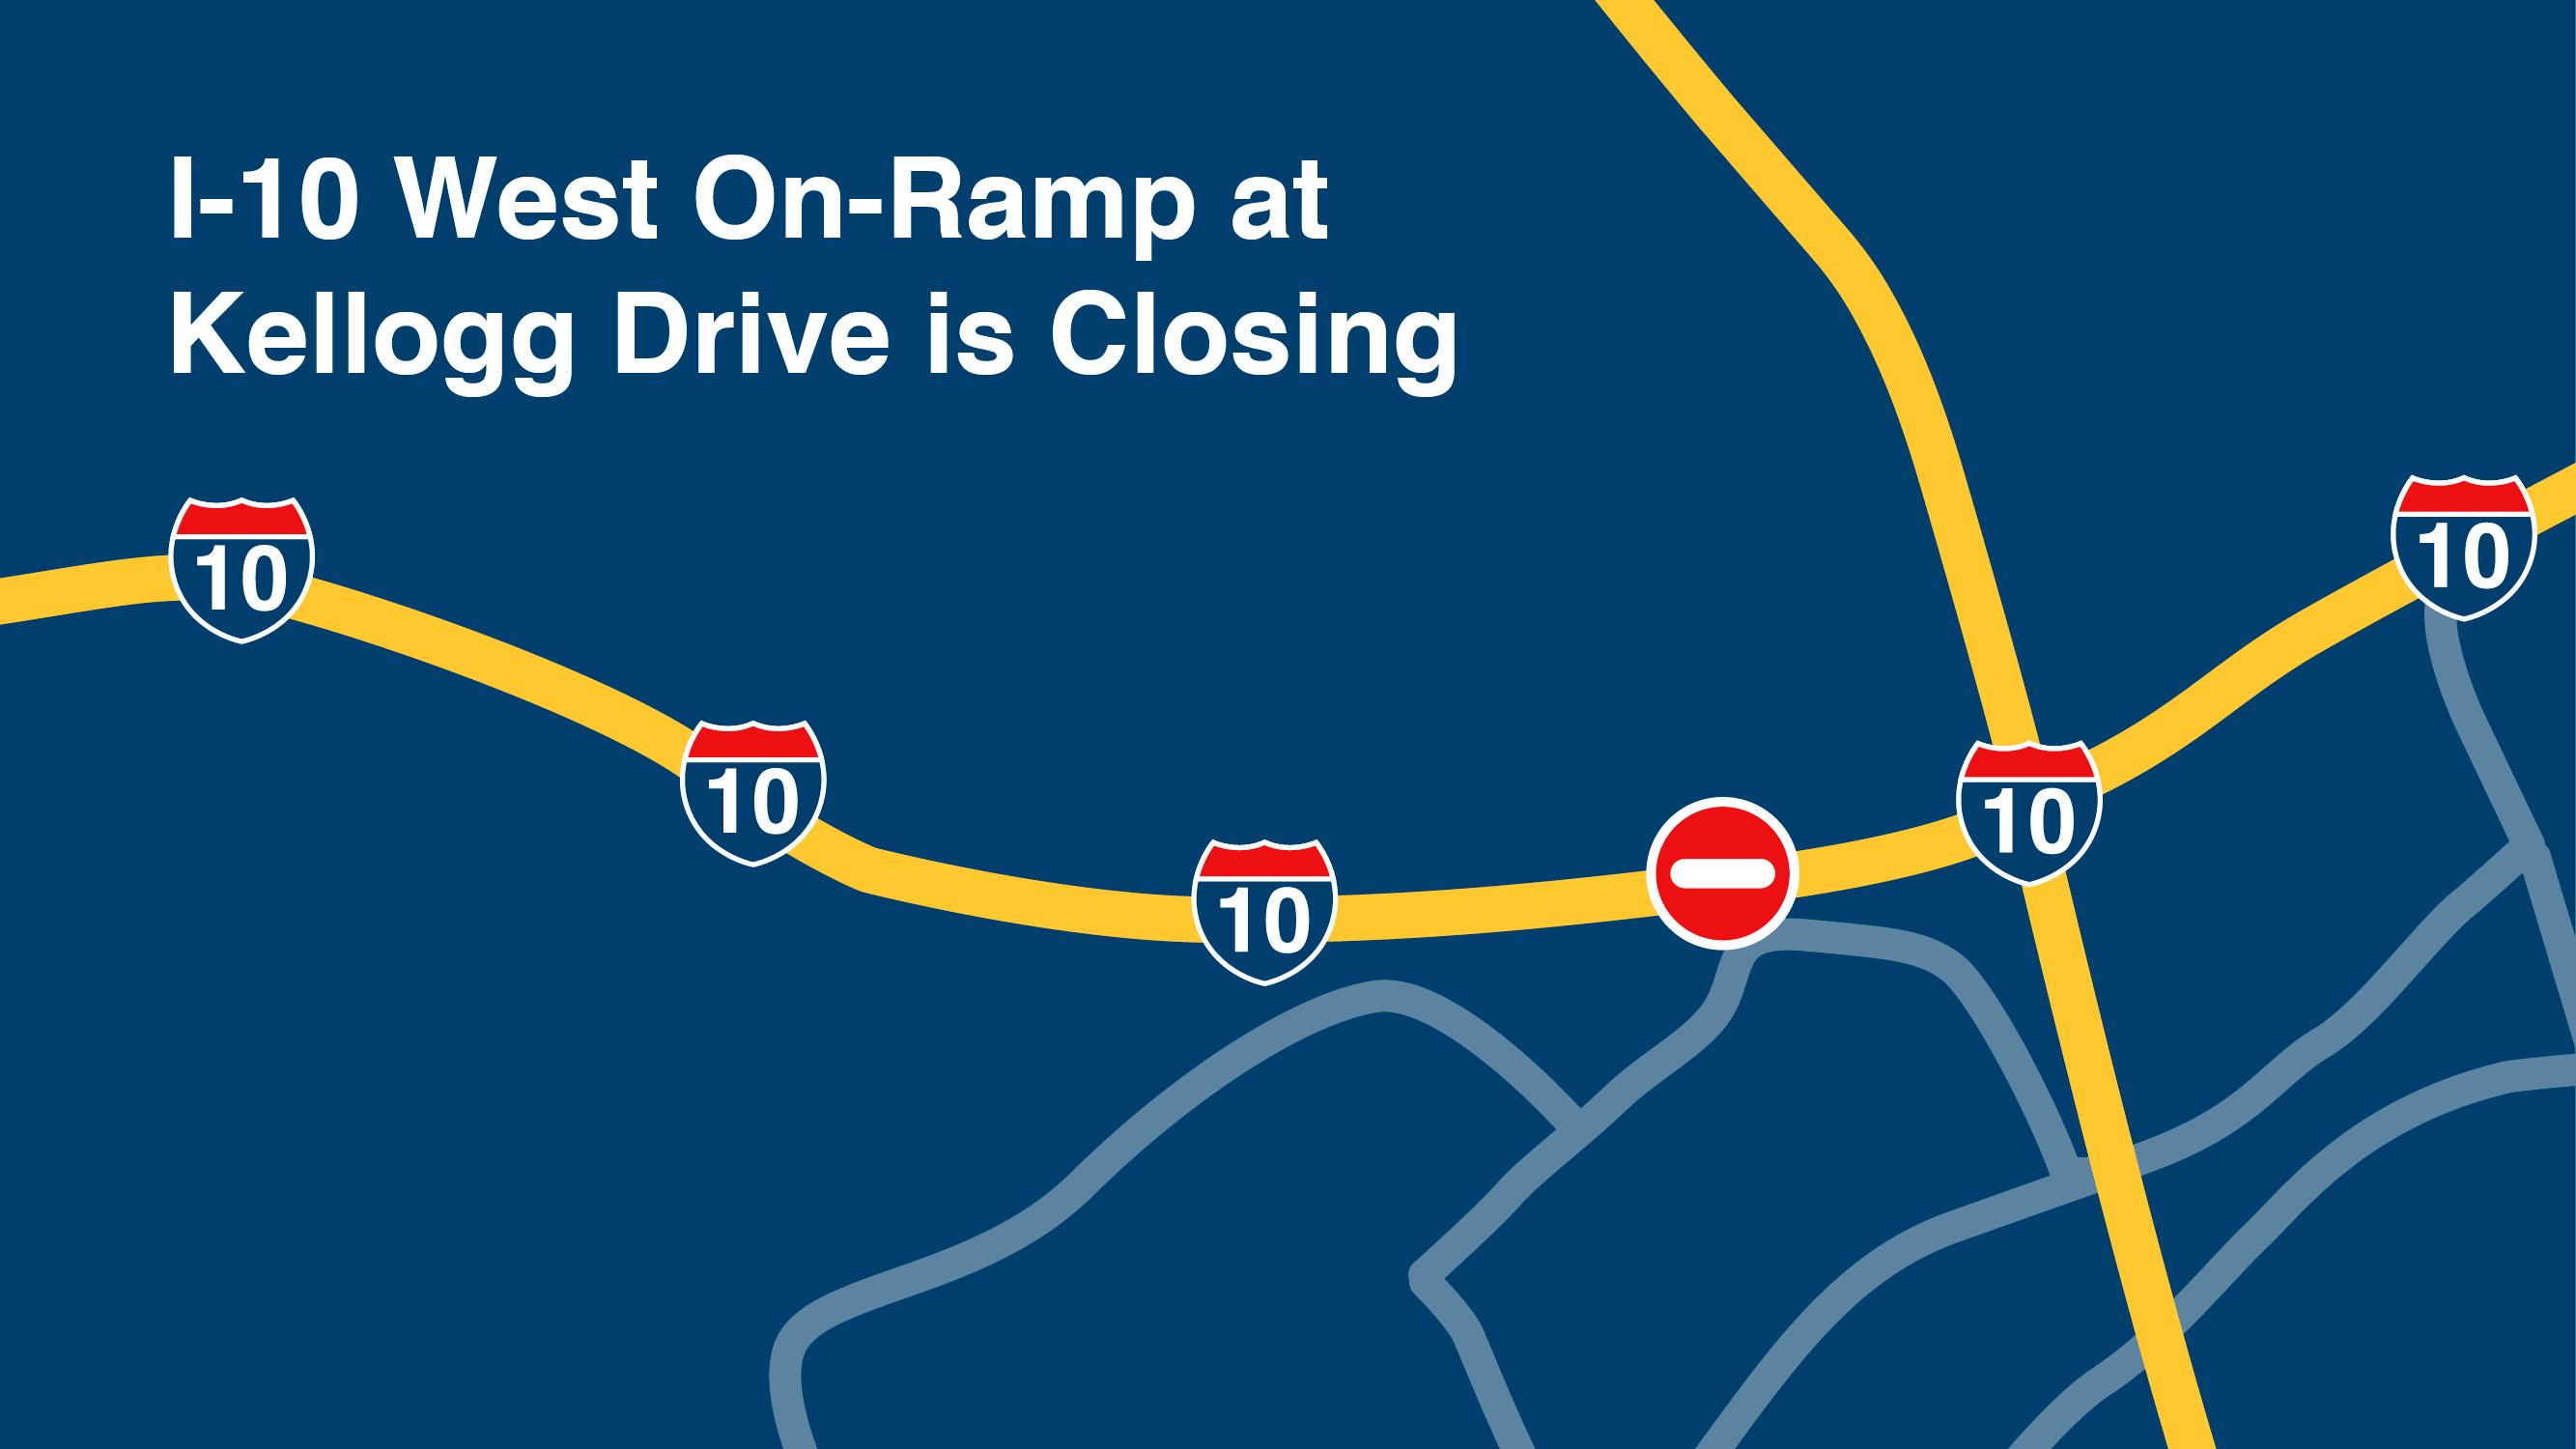 The westbound San Bernardino Freeway (I-10) on-ramp at Kellogg Drive will be closing.